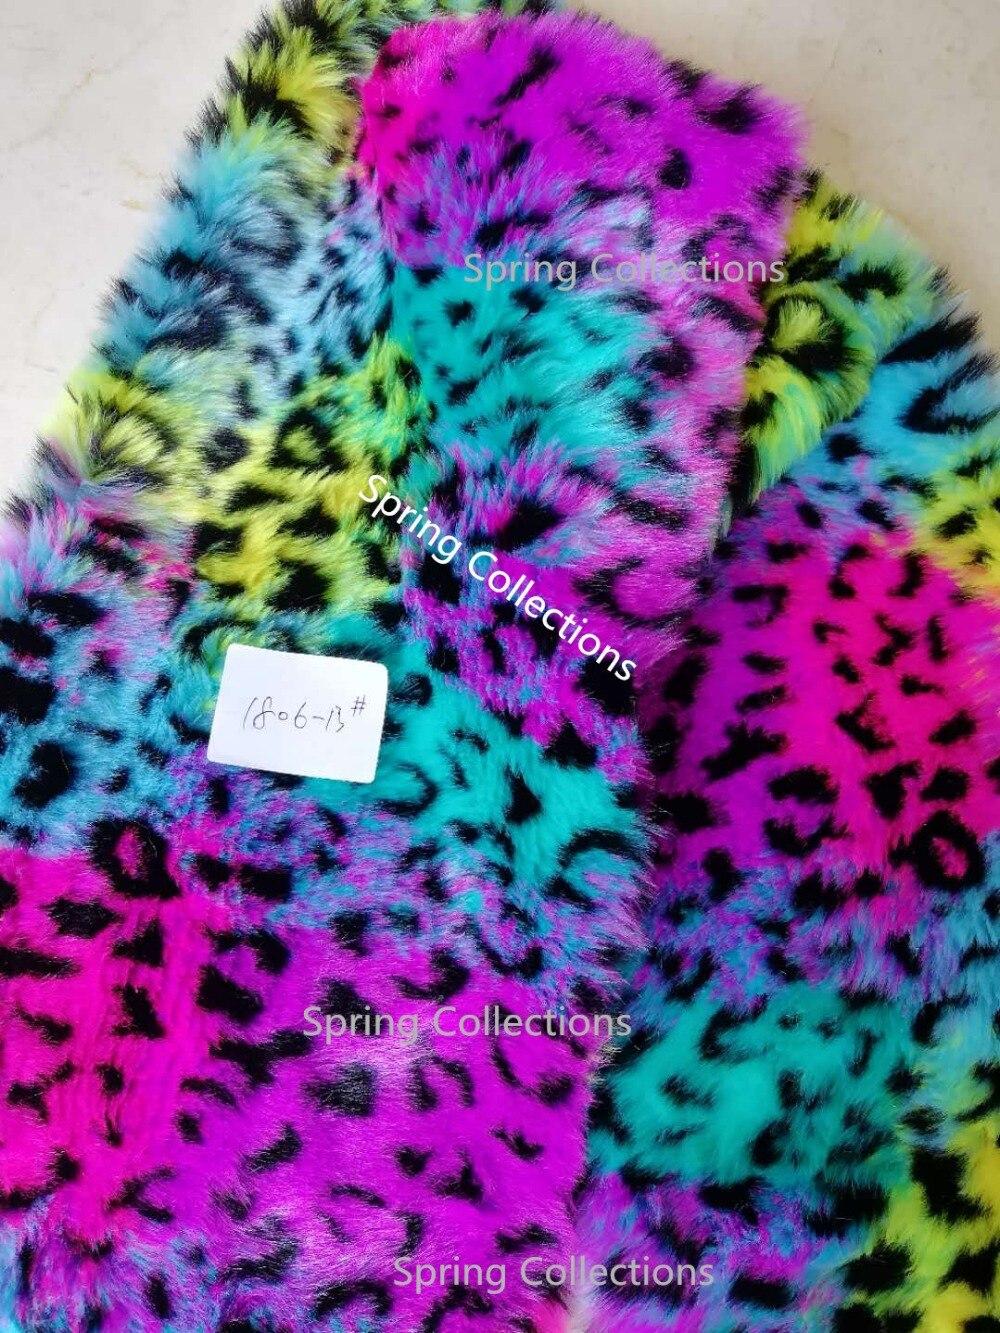 160cm*91cm High-grade Jacquard Fur,Imitation Leopard Fabric Plush Carpet Mats Fabric,DIY Handmade Faux Fur Fabric 15mm Long Hair